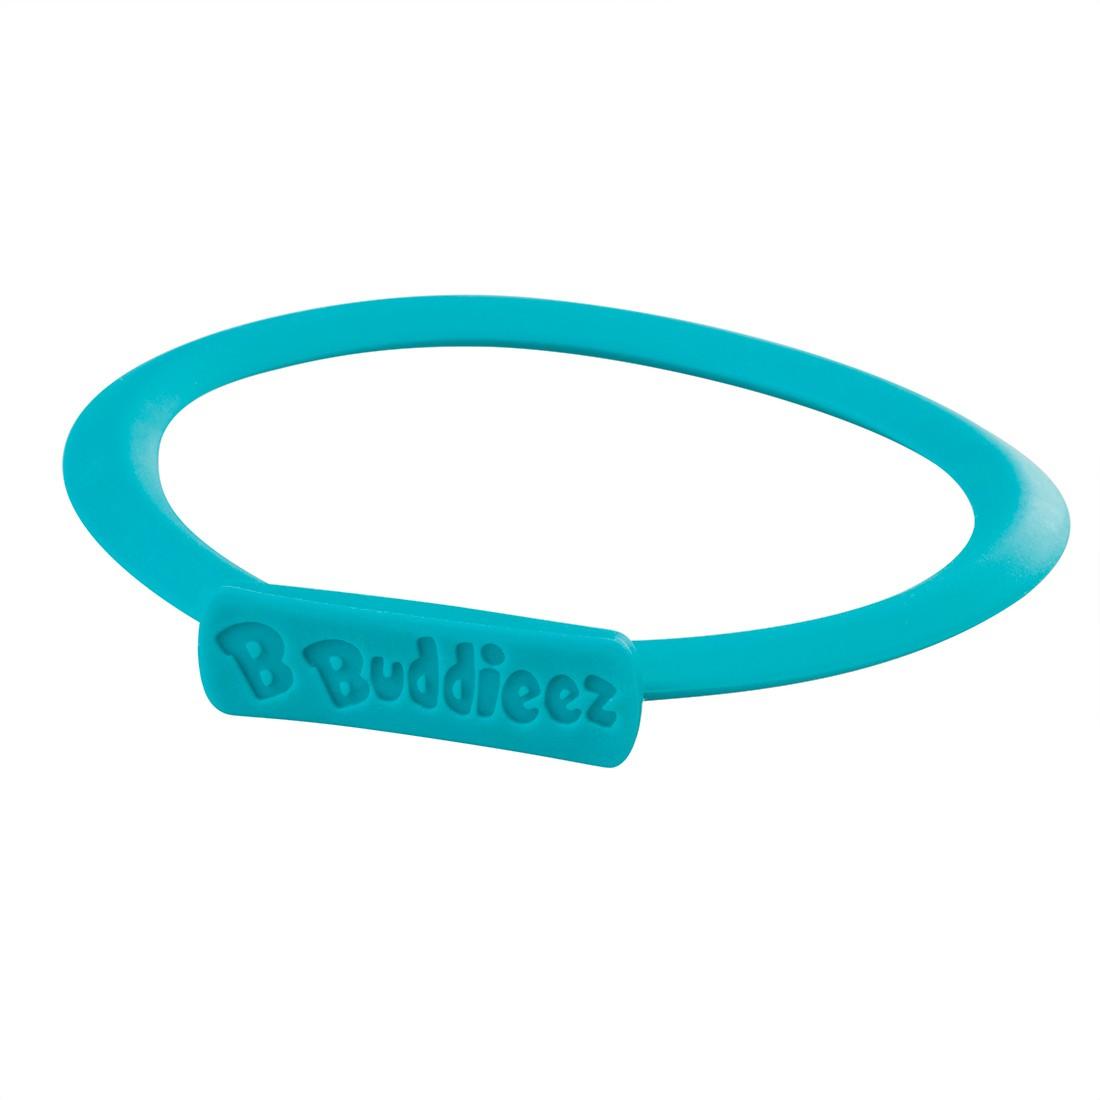 Bbuddieez Bands [image]